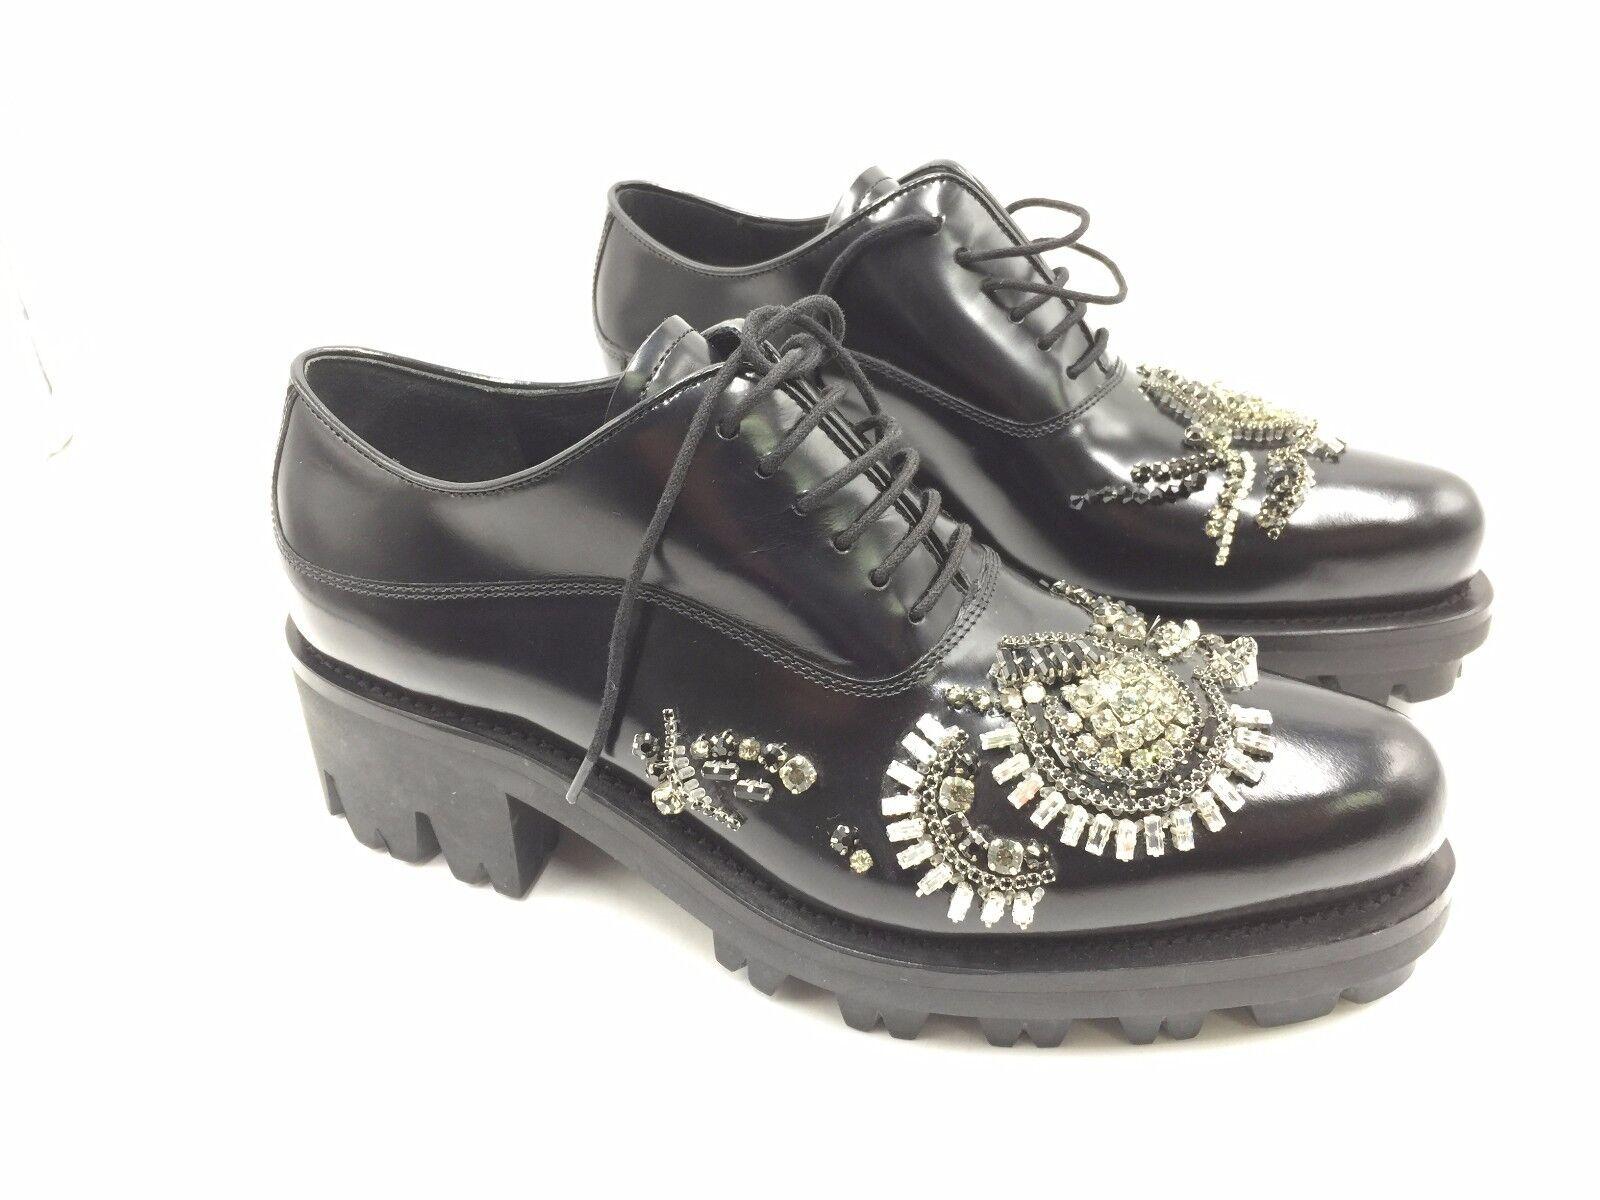 3400 Schuhe NEW PRADA Damenschuhe BLACK CRYSTAL Platform SNEAKERS LEATHER Schuhe 3400 37.5 7.5 c0d656